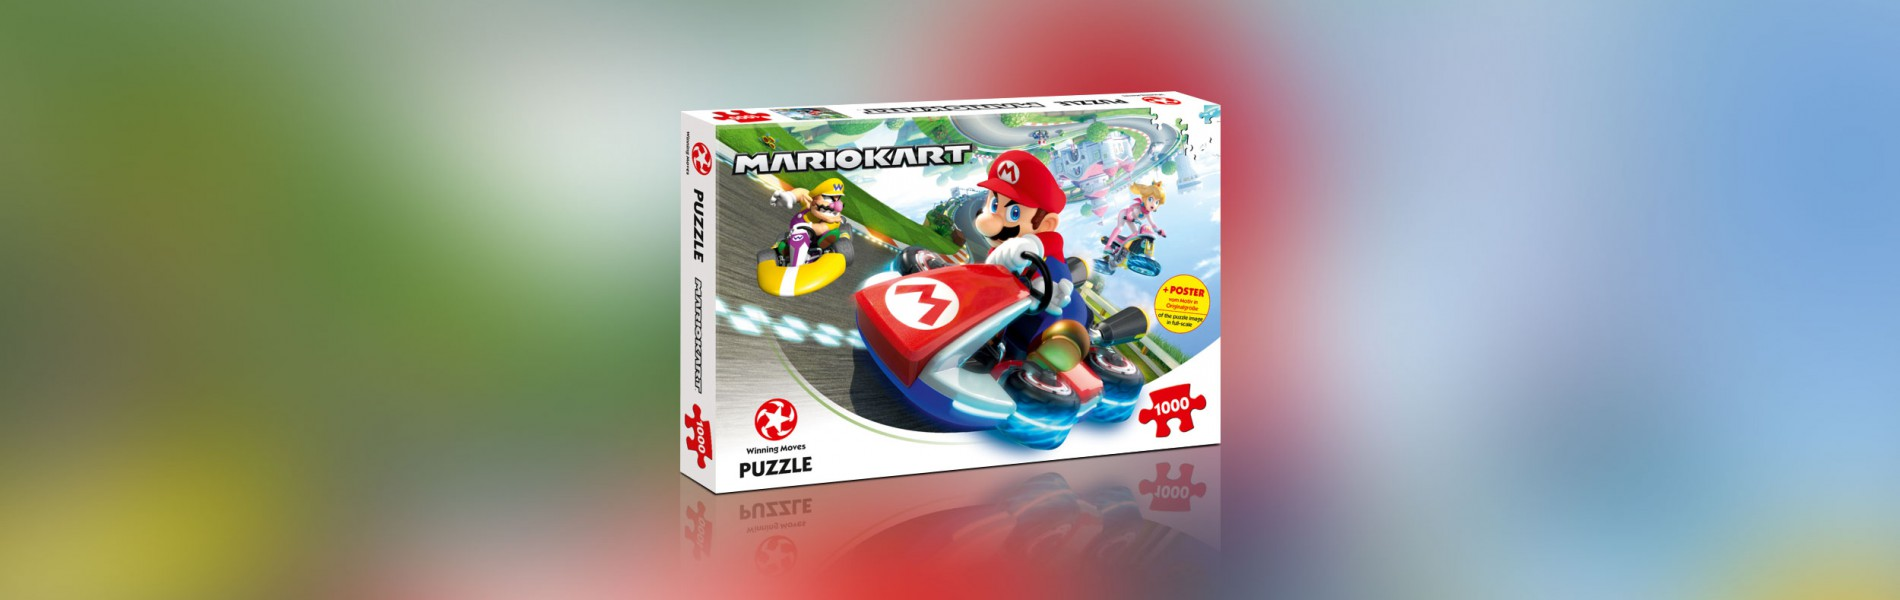 Puzzle Mario Kart – Funracer 1000 Teile